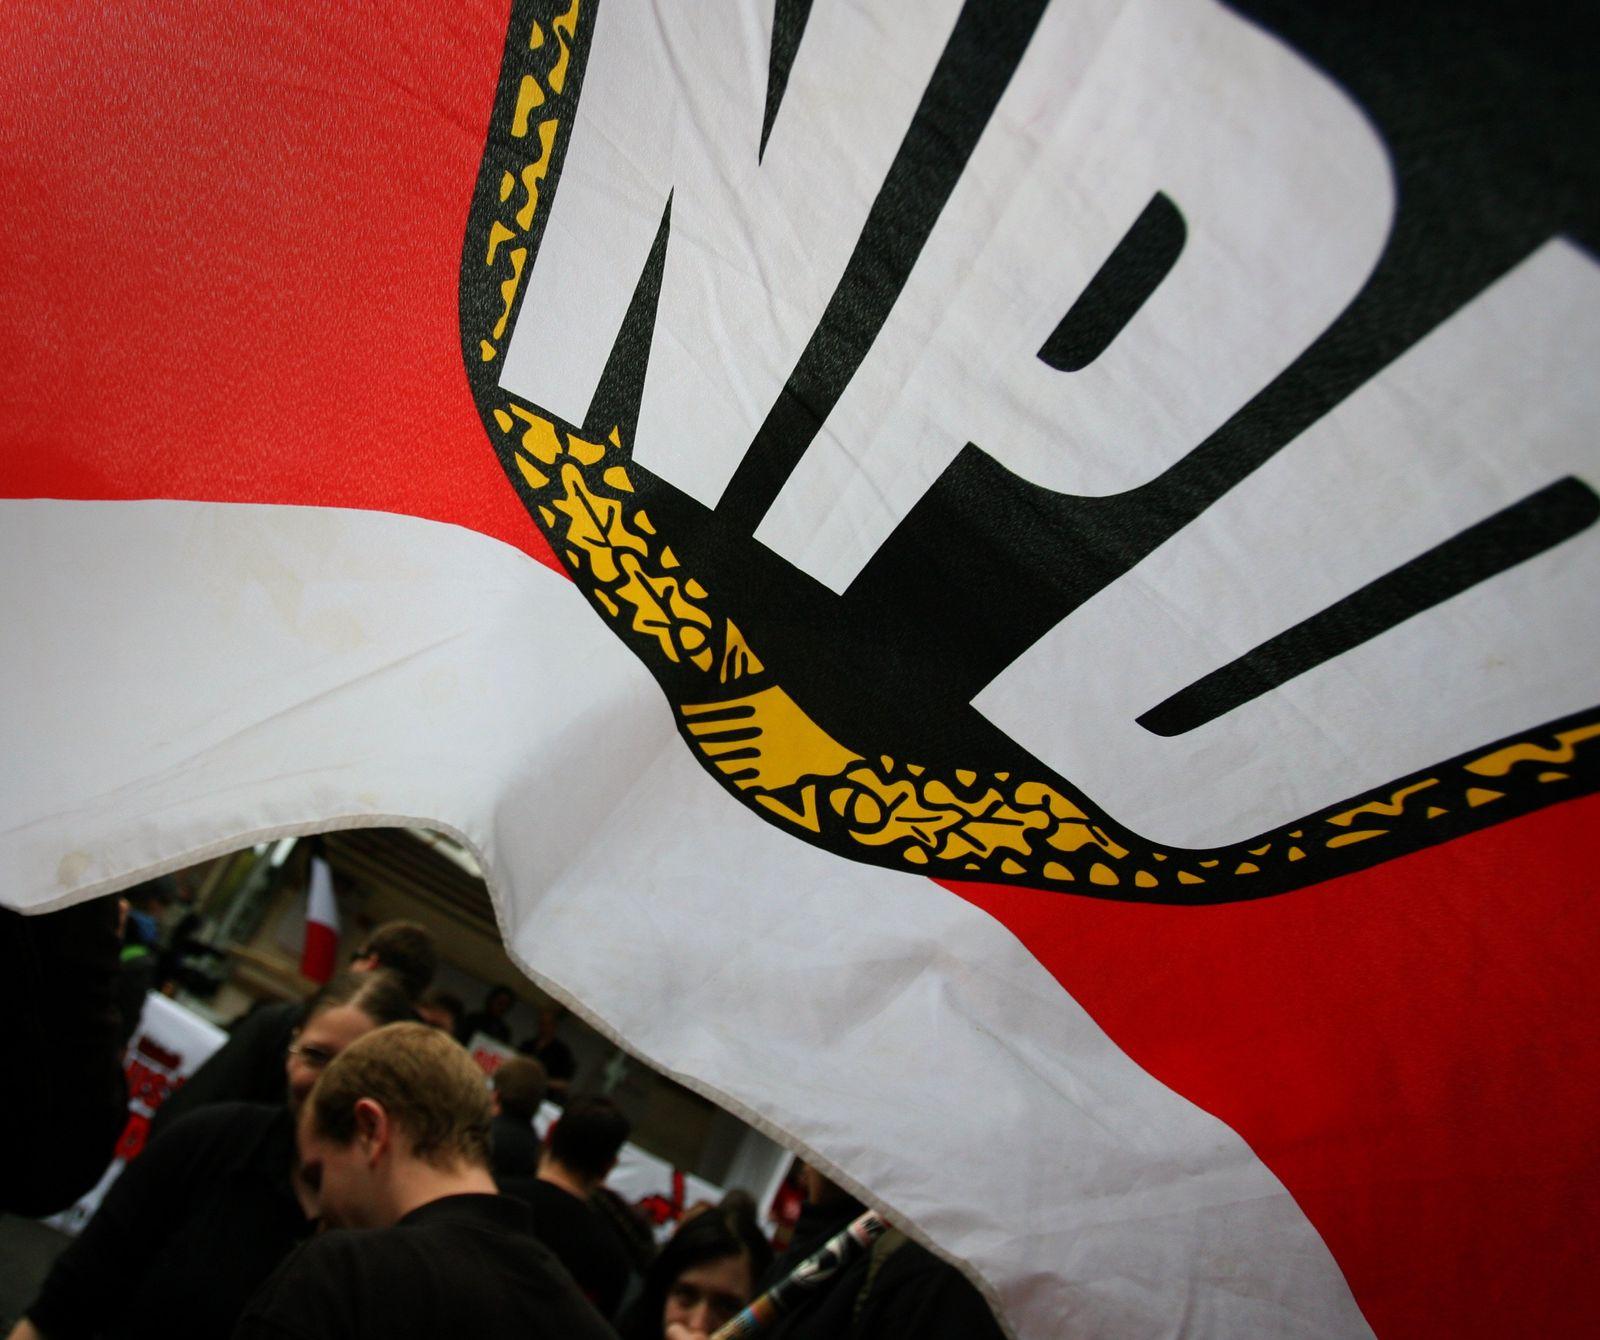 NPD droht der finanzielle Ruin